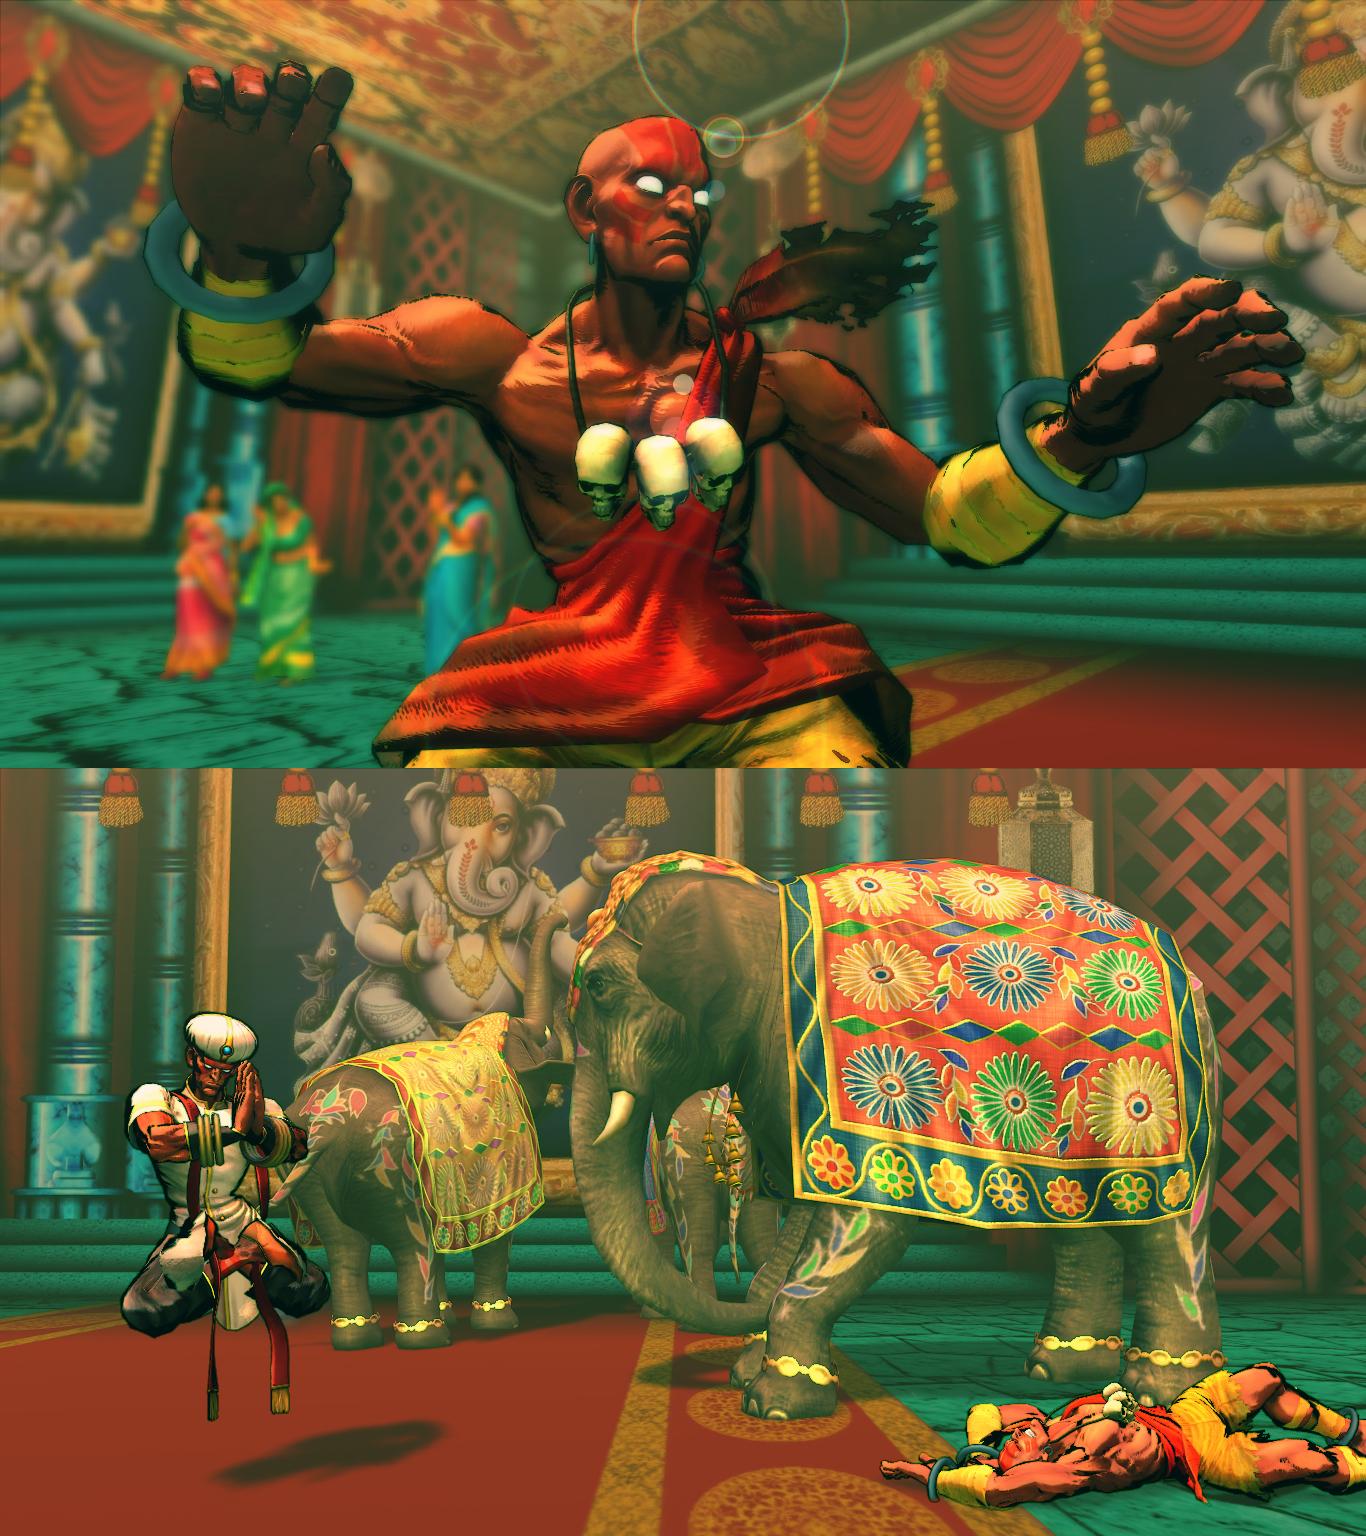 ssfivae_exciting_india_scene_by_monkeygigabuster-d76oly4.jpg